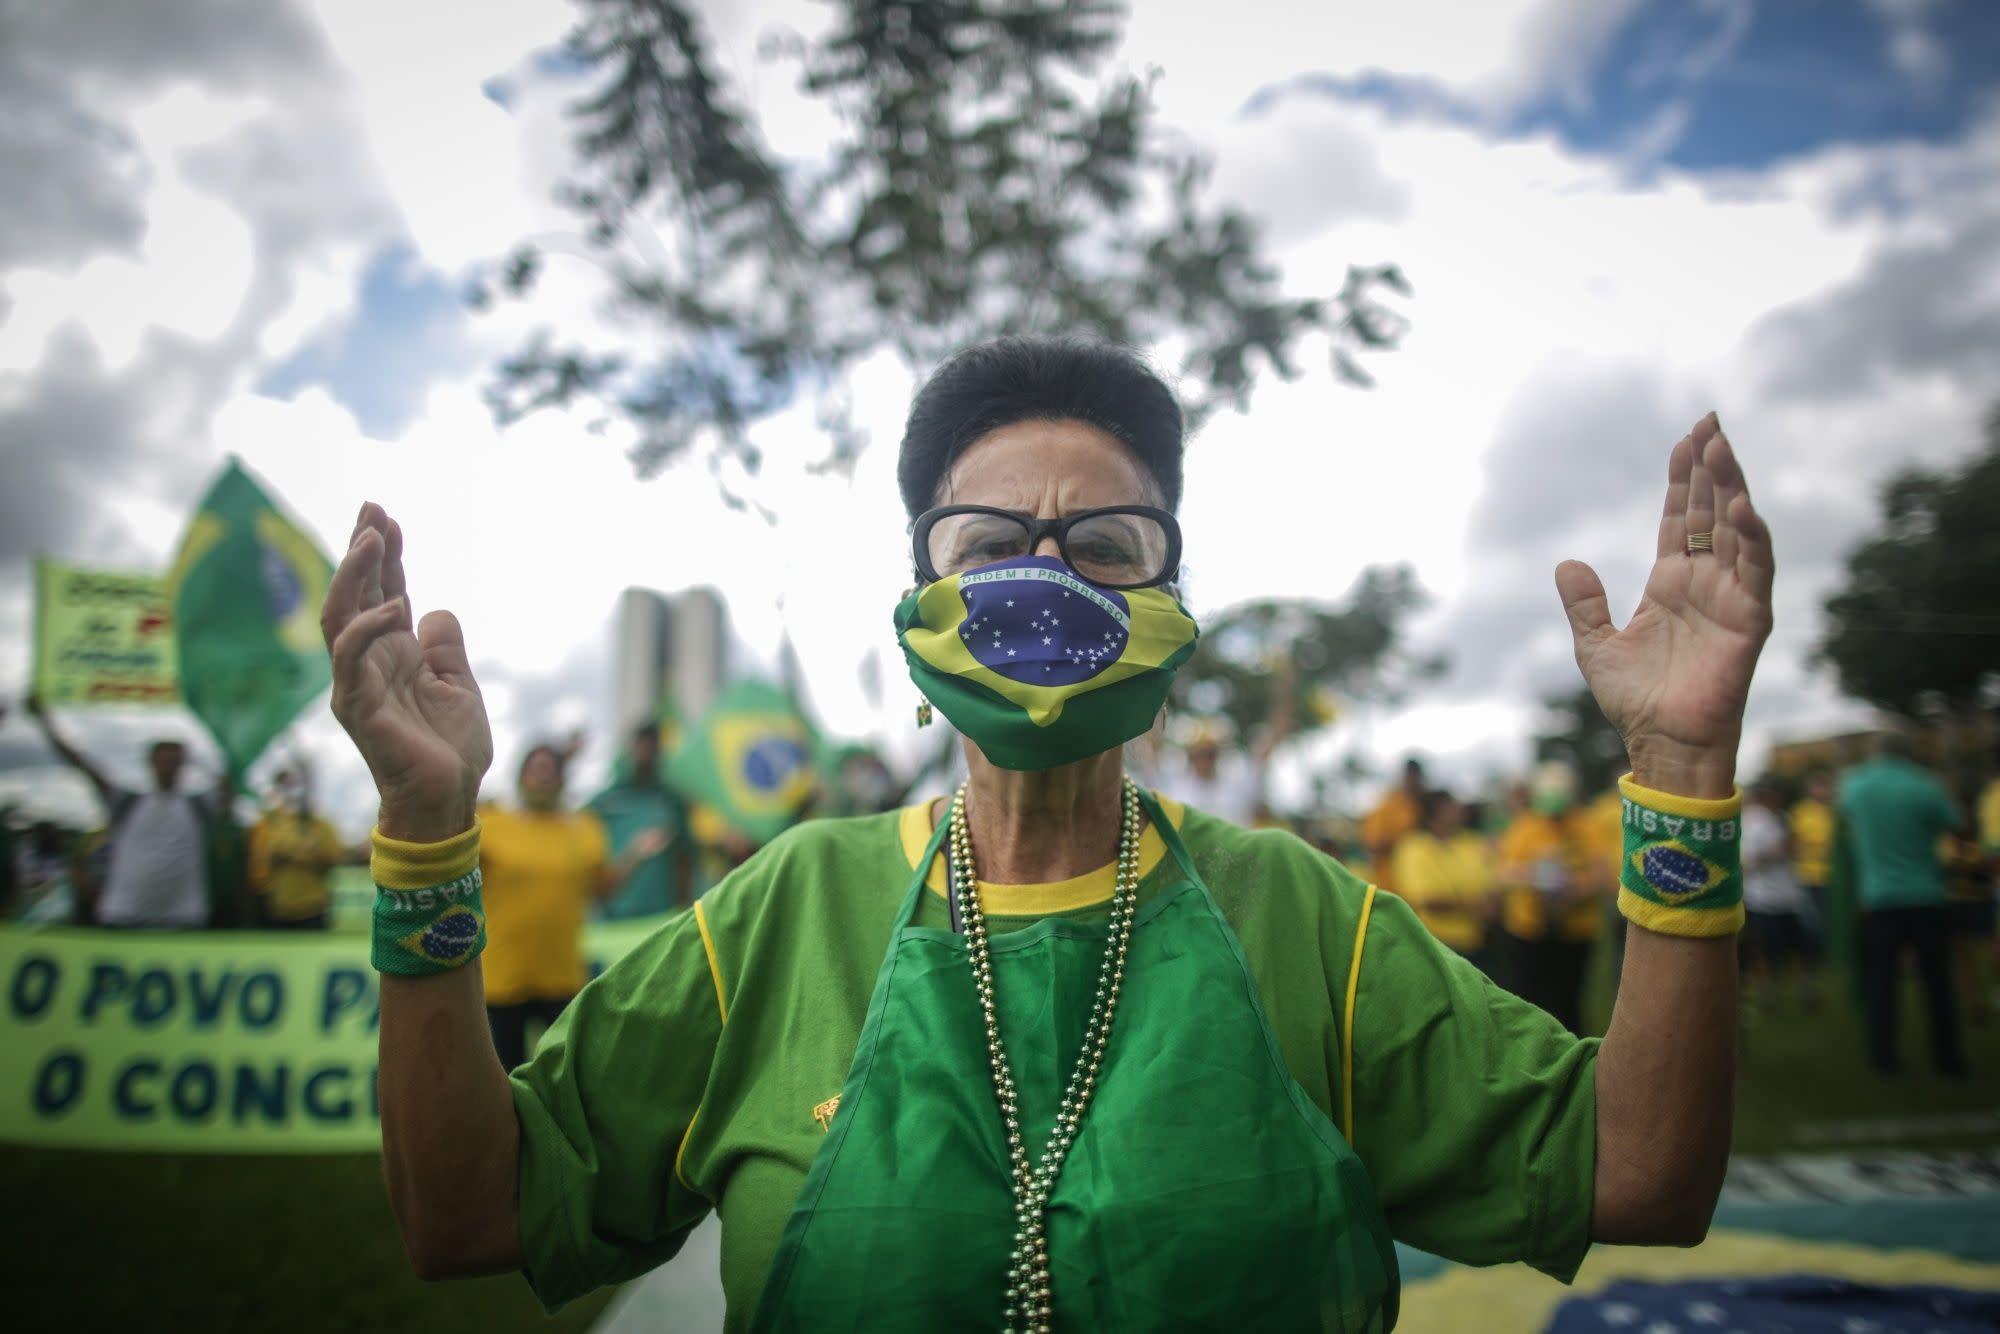 Bolsonaro Lauds Protesters Taking to Streets Despite Virus Risk